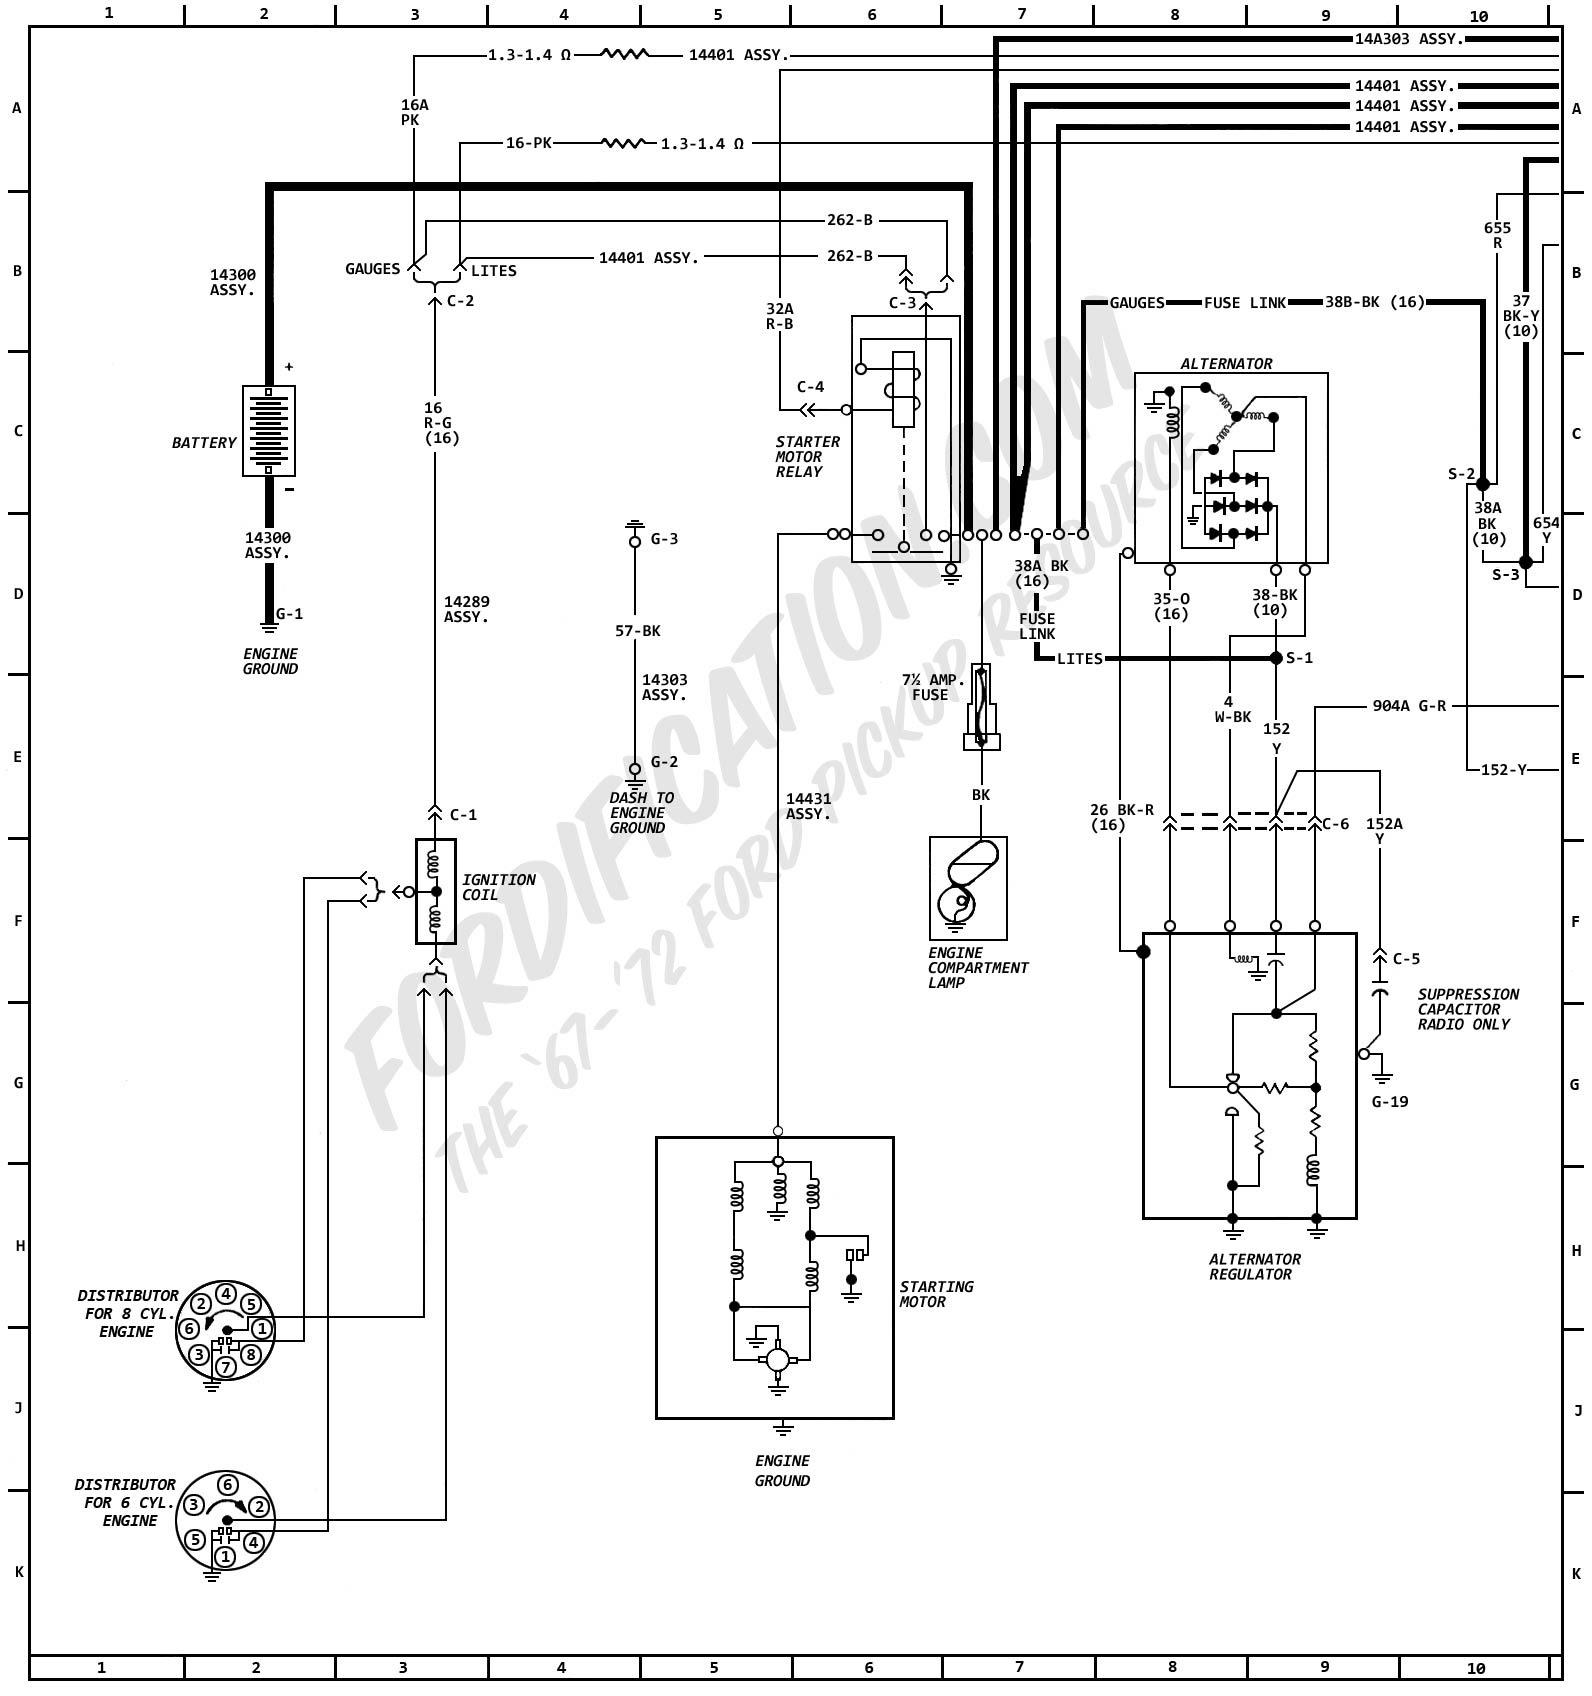 1976 Ford Turn Signal Switch Wiring Diagram